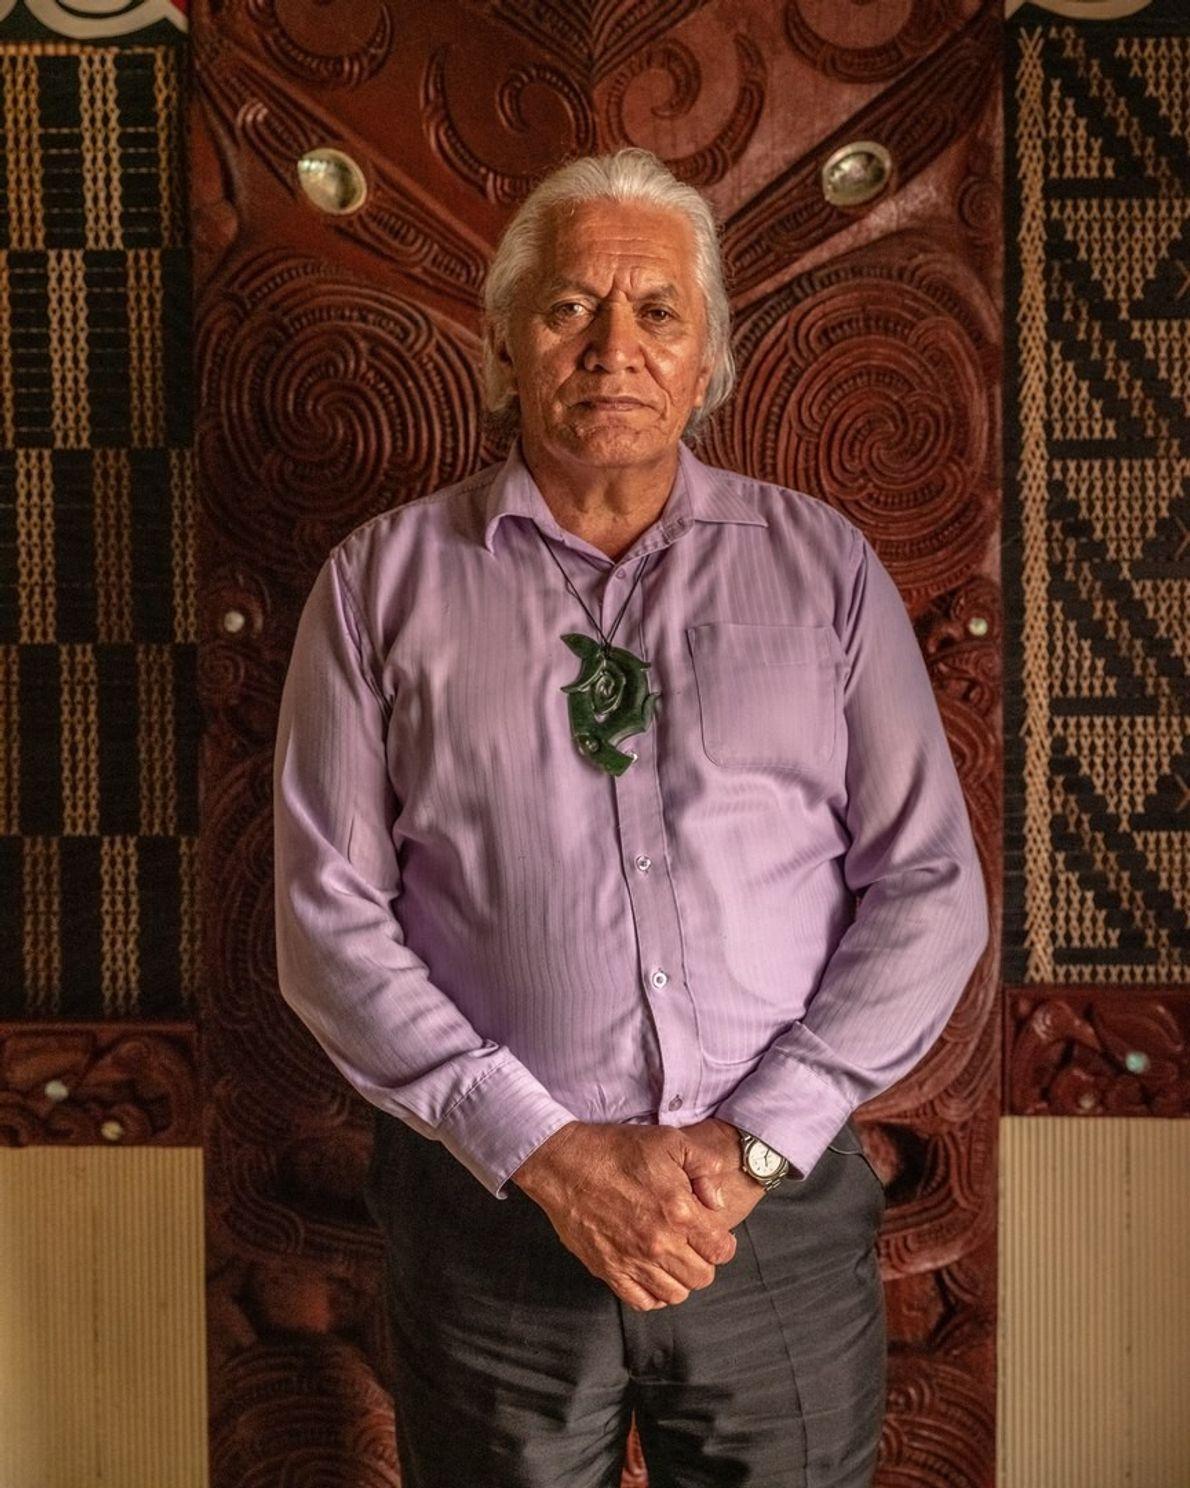 Te Taru White New Zealand, Portraits